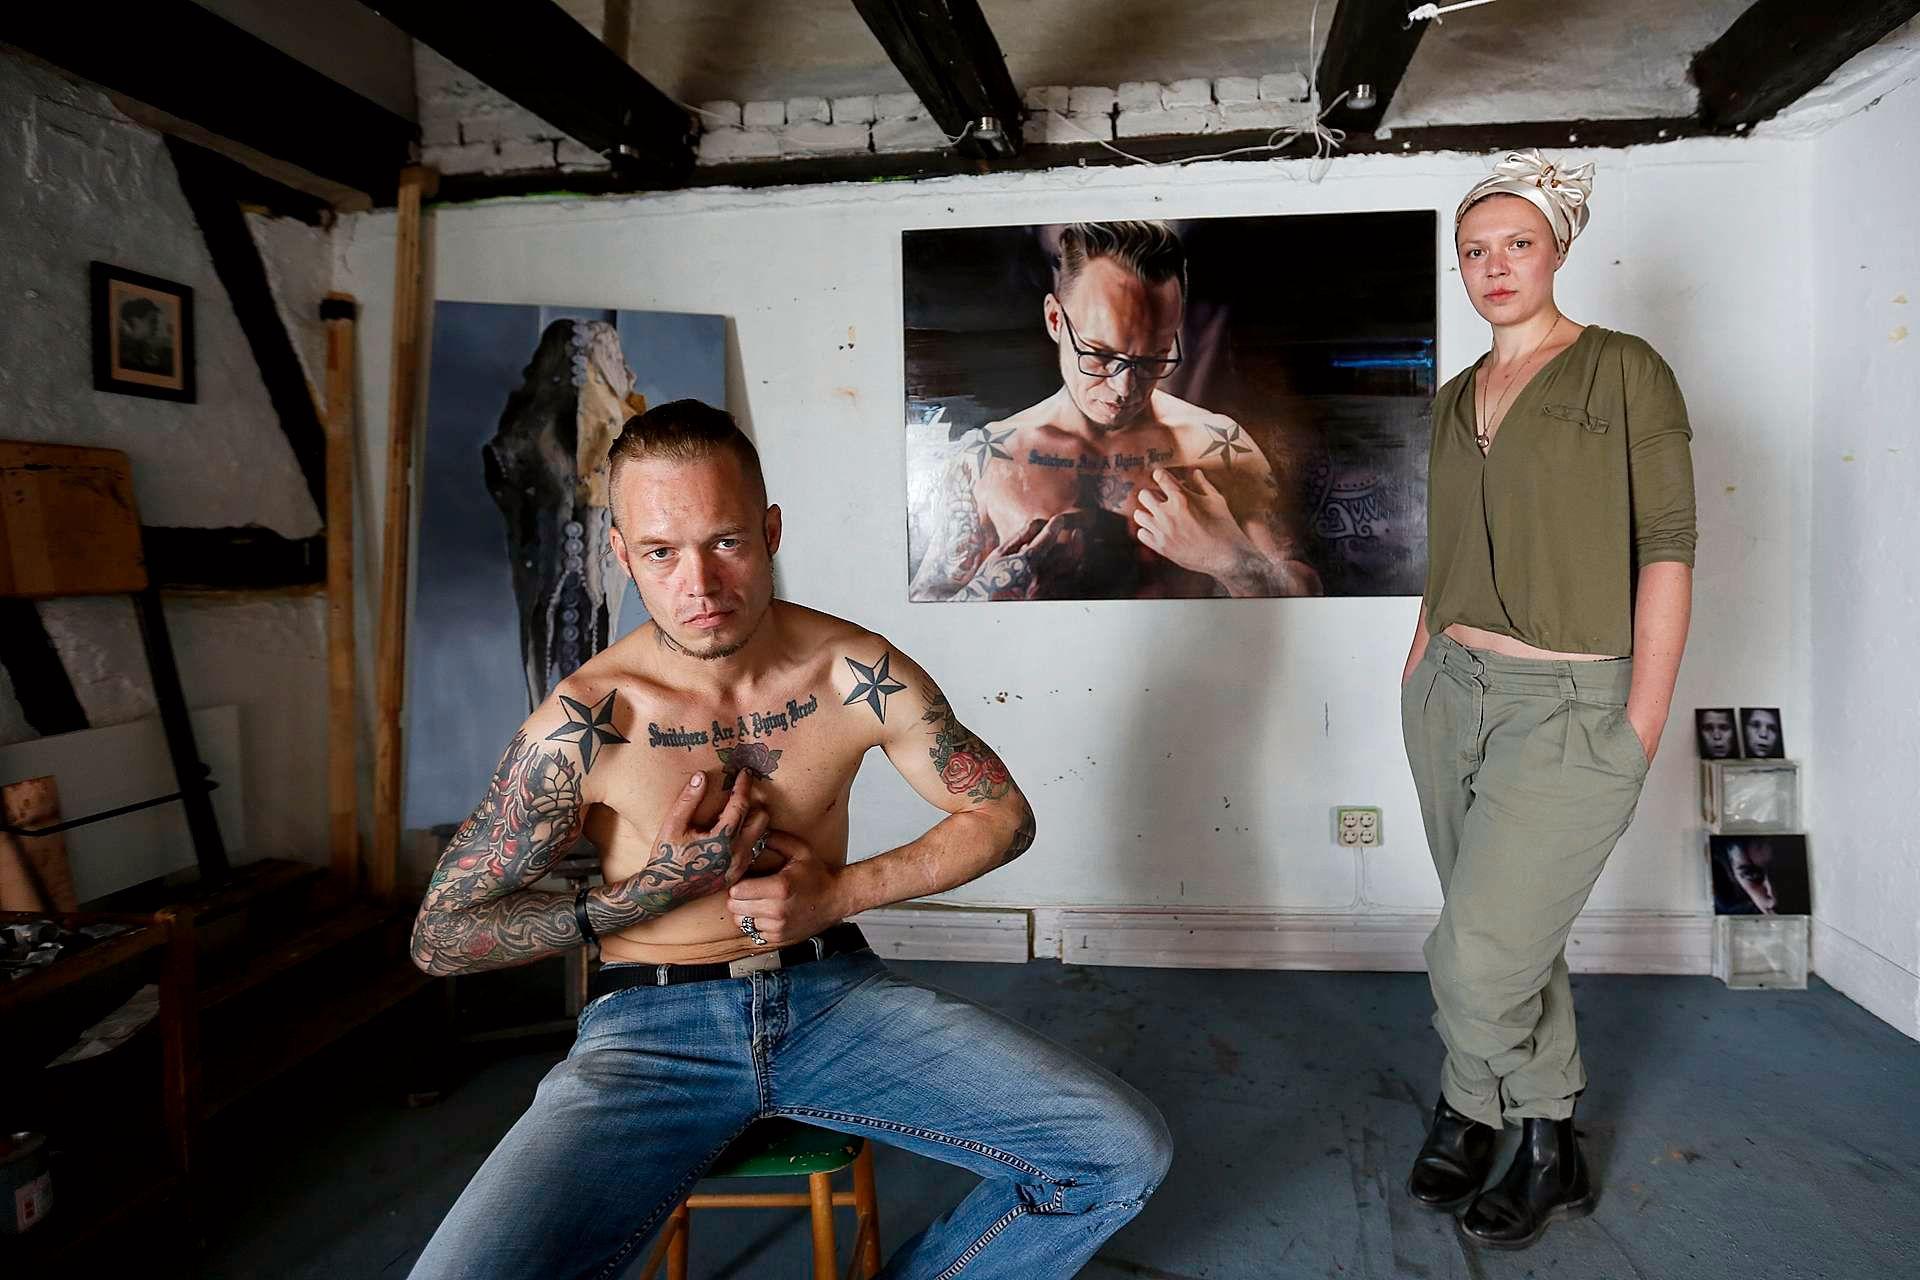 La pintora y el ladrón documental Altàntida Filmfest